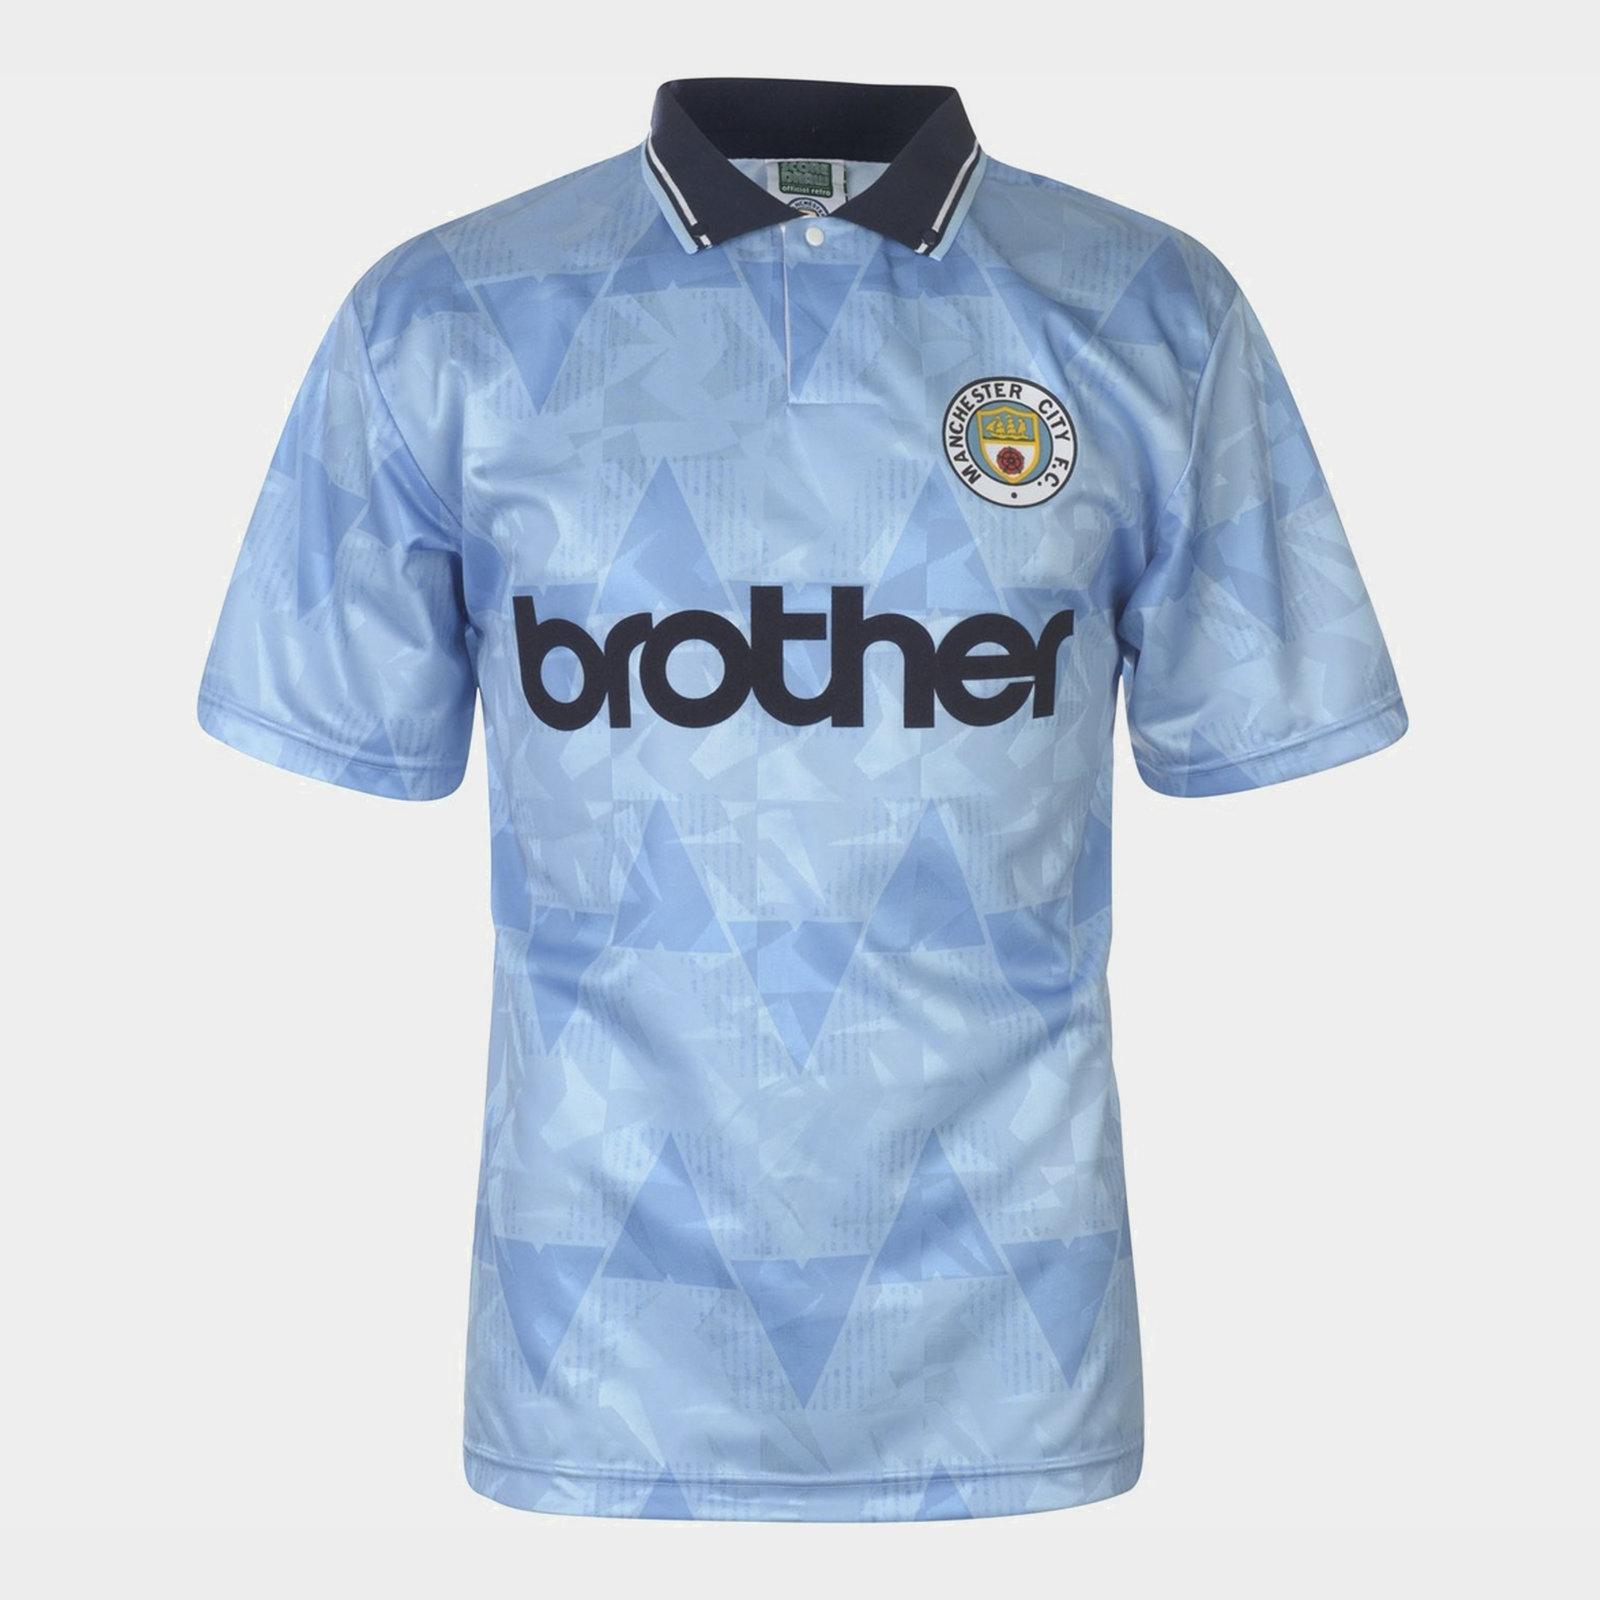 Manchester City 89 Retro Football Shirt